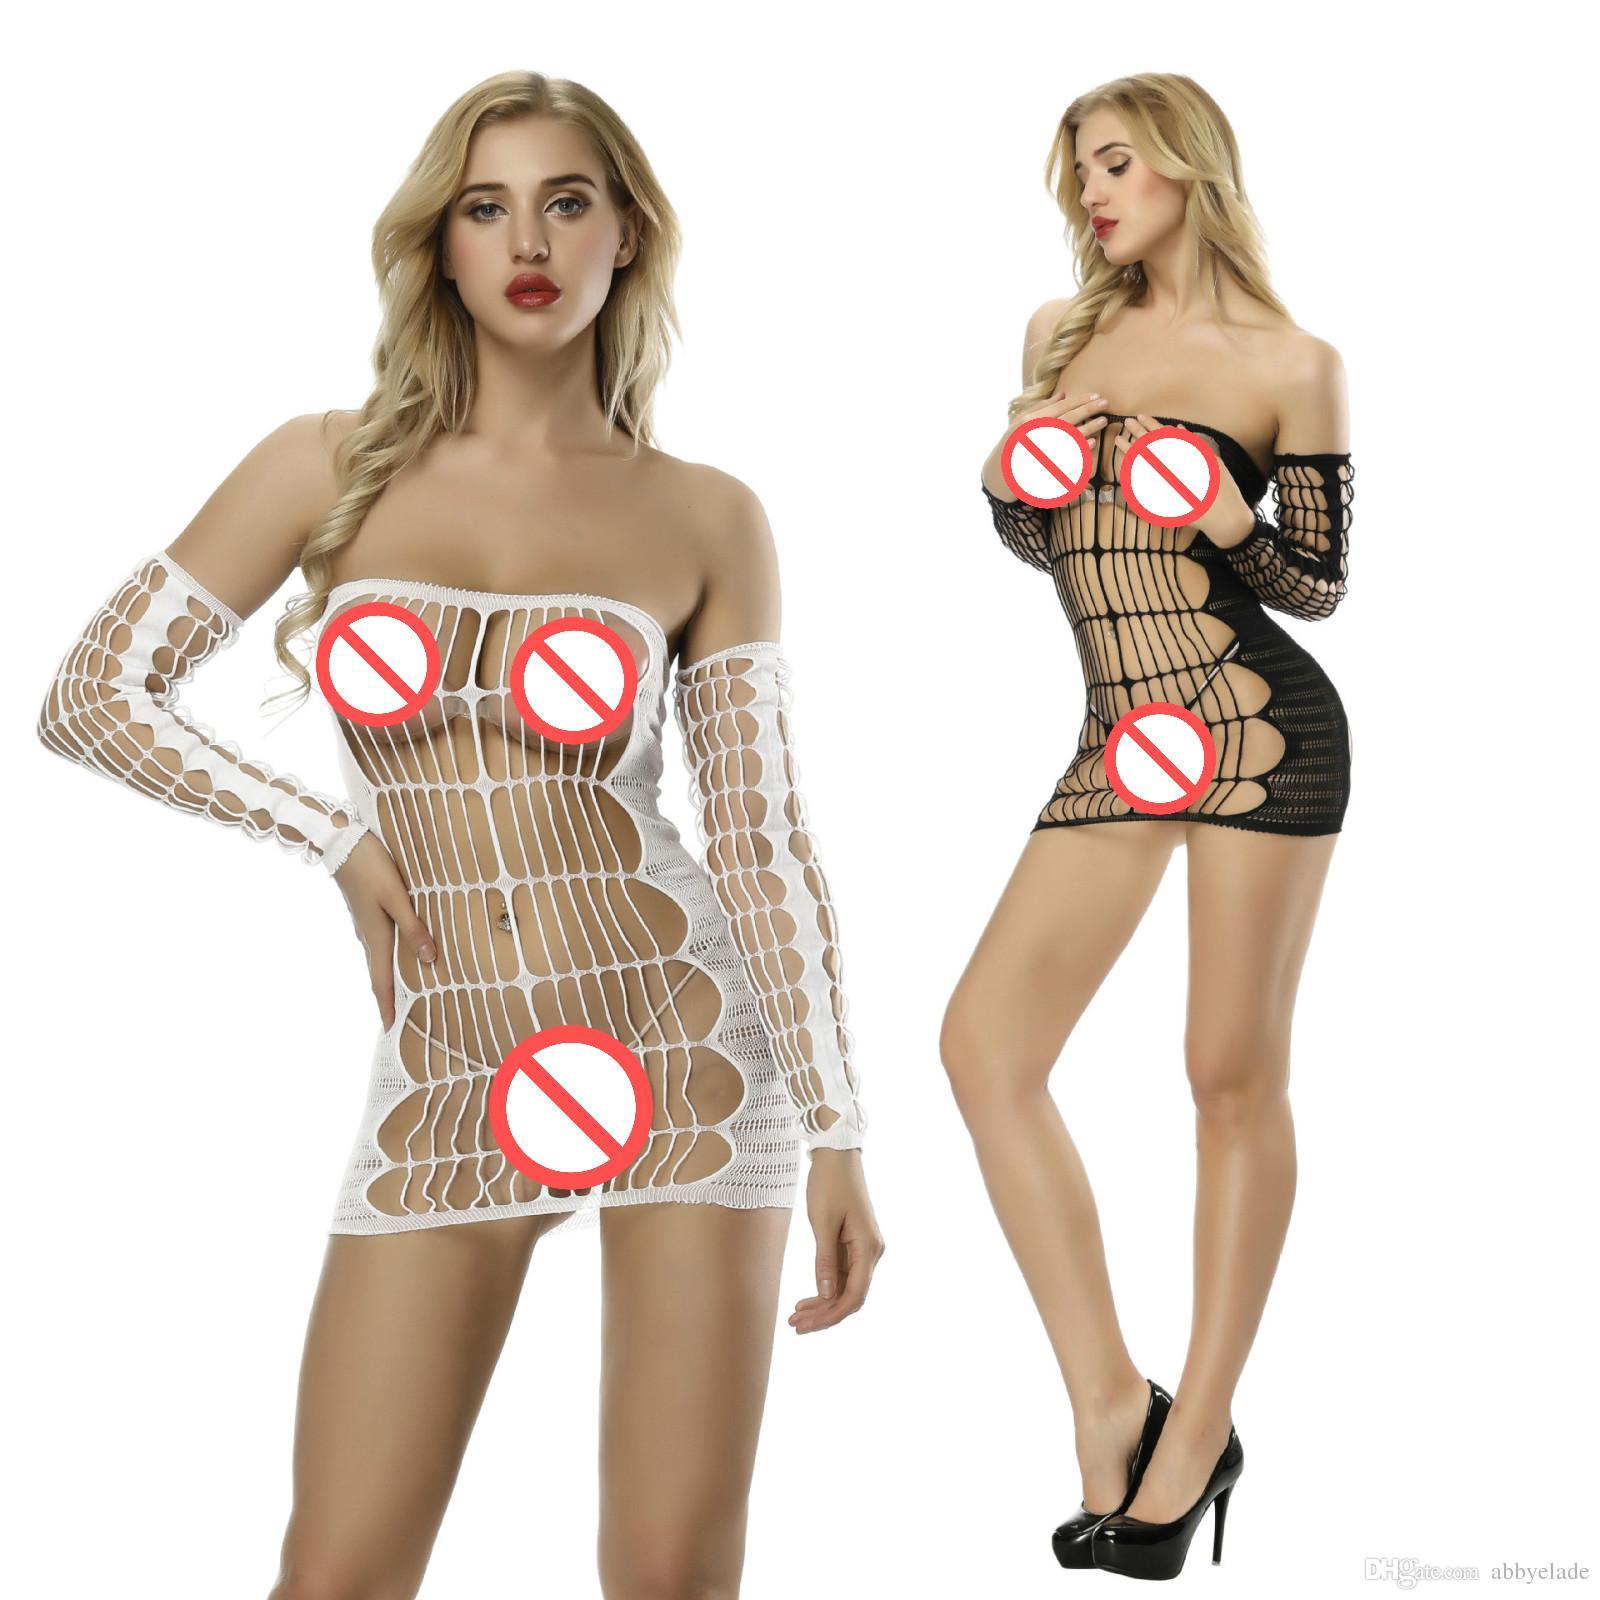 2b1553f44807 Acquista Sleepwear Erotico Sexy Abito A Rete Lingerie Langerie Trasparente  Tessuto Babydoll Costume Camicia Da Notte Chemise Hot Sexi Bodywear  Bodywear A ...